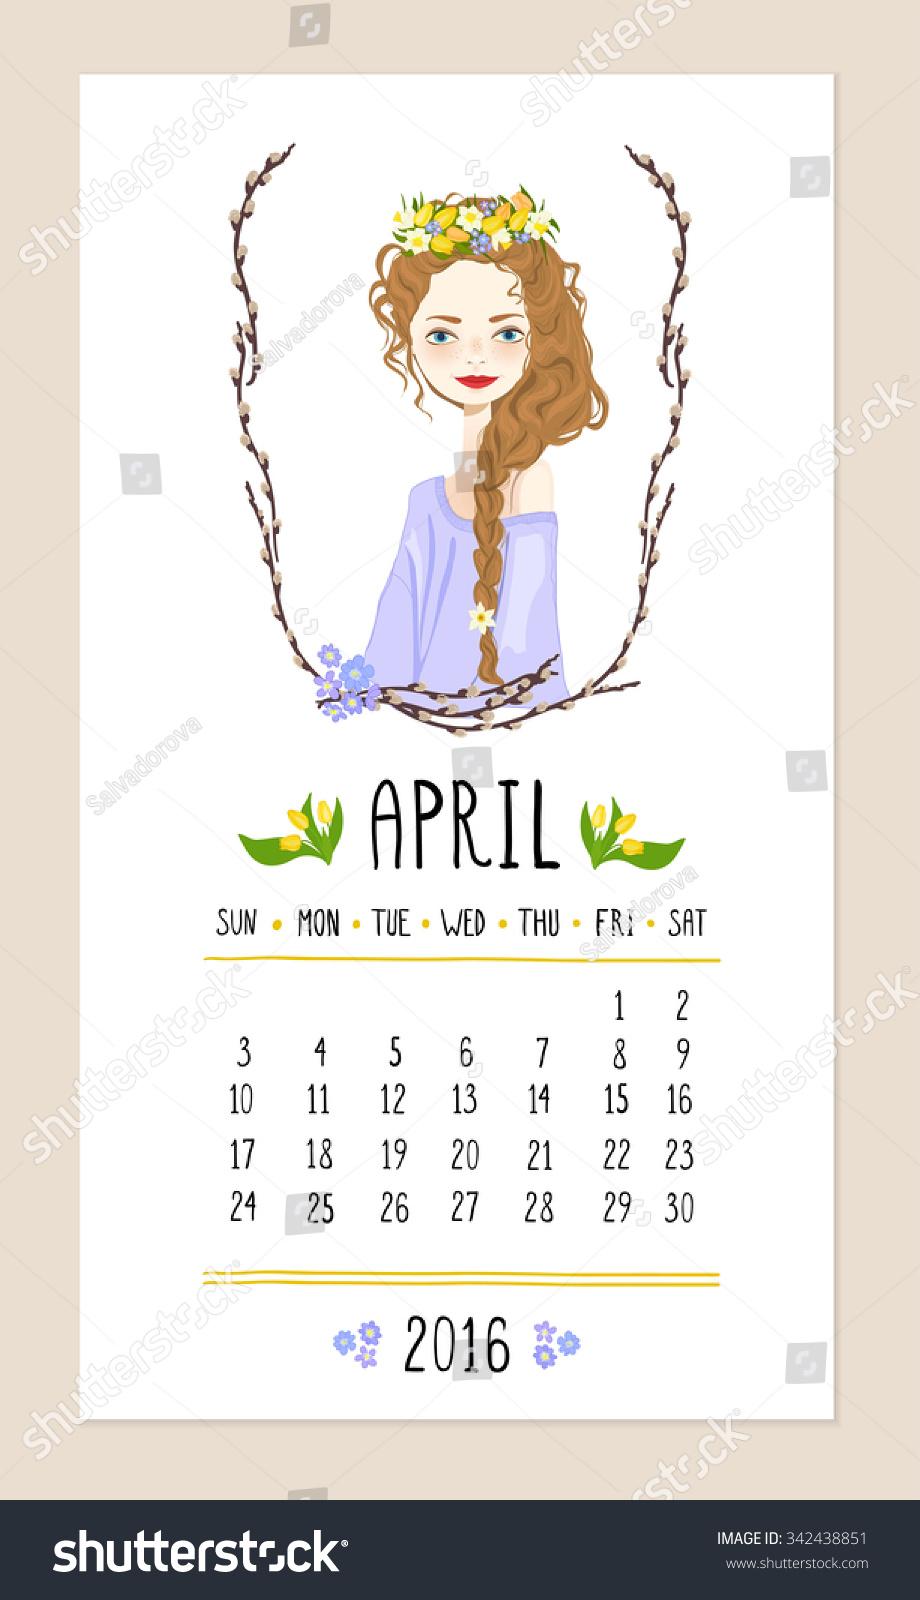 Calendar Girl April Read : April calendar cute girl wreath stock vector